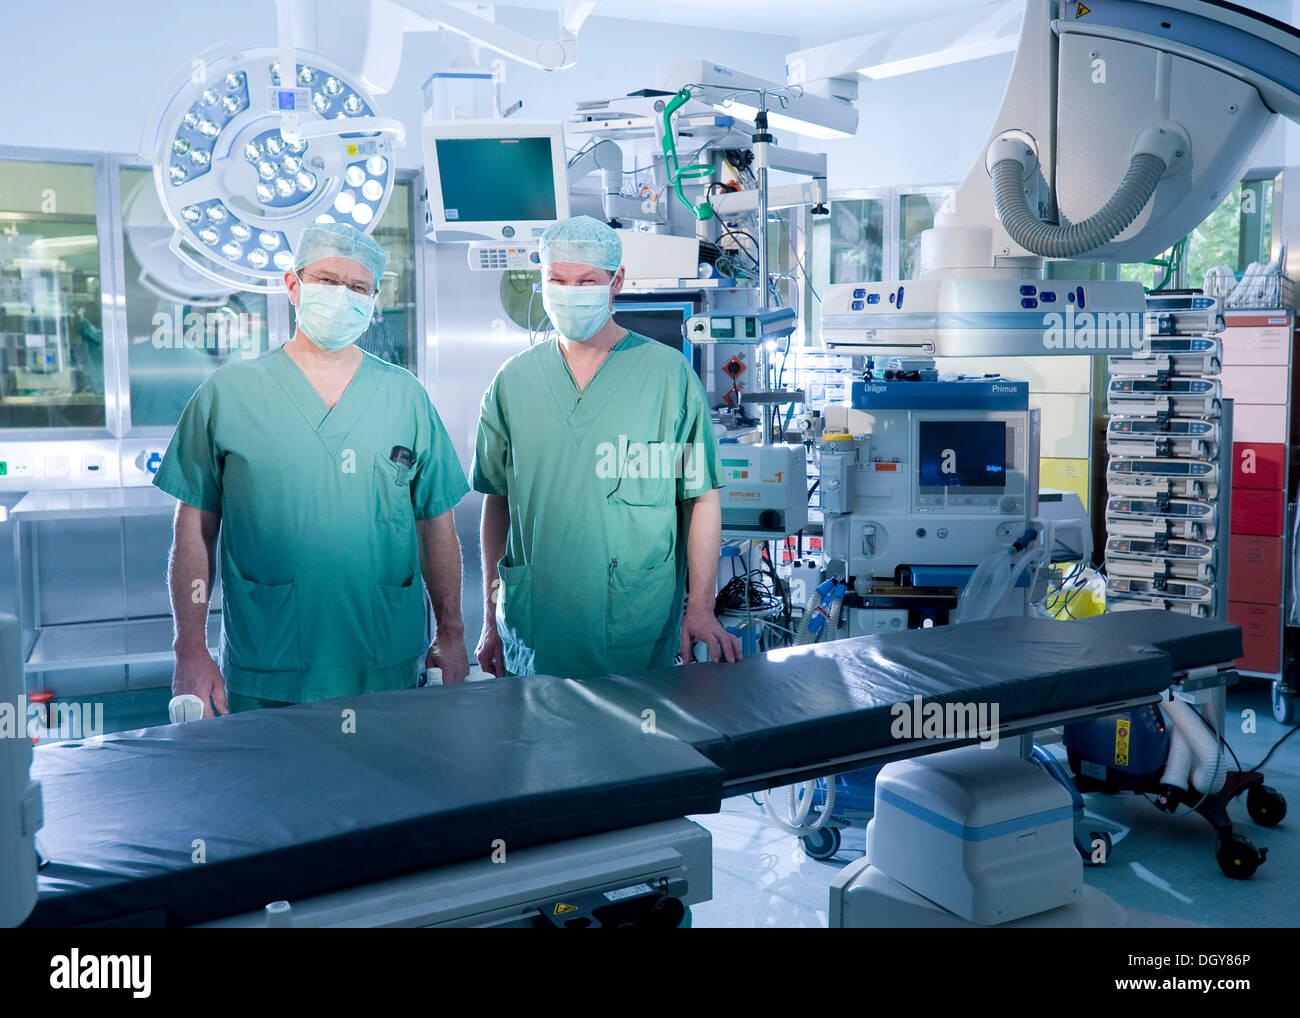 Hybrid operating room, Deutsches Herzzentrum Berlin or German cardiac center, Berlin - Stock Image